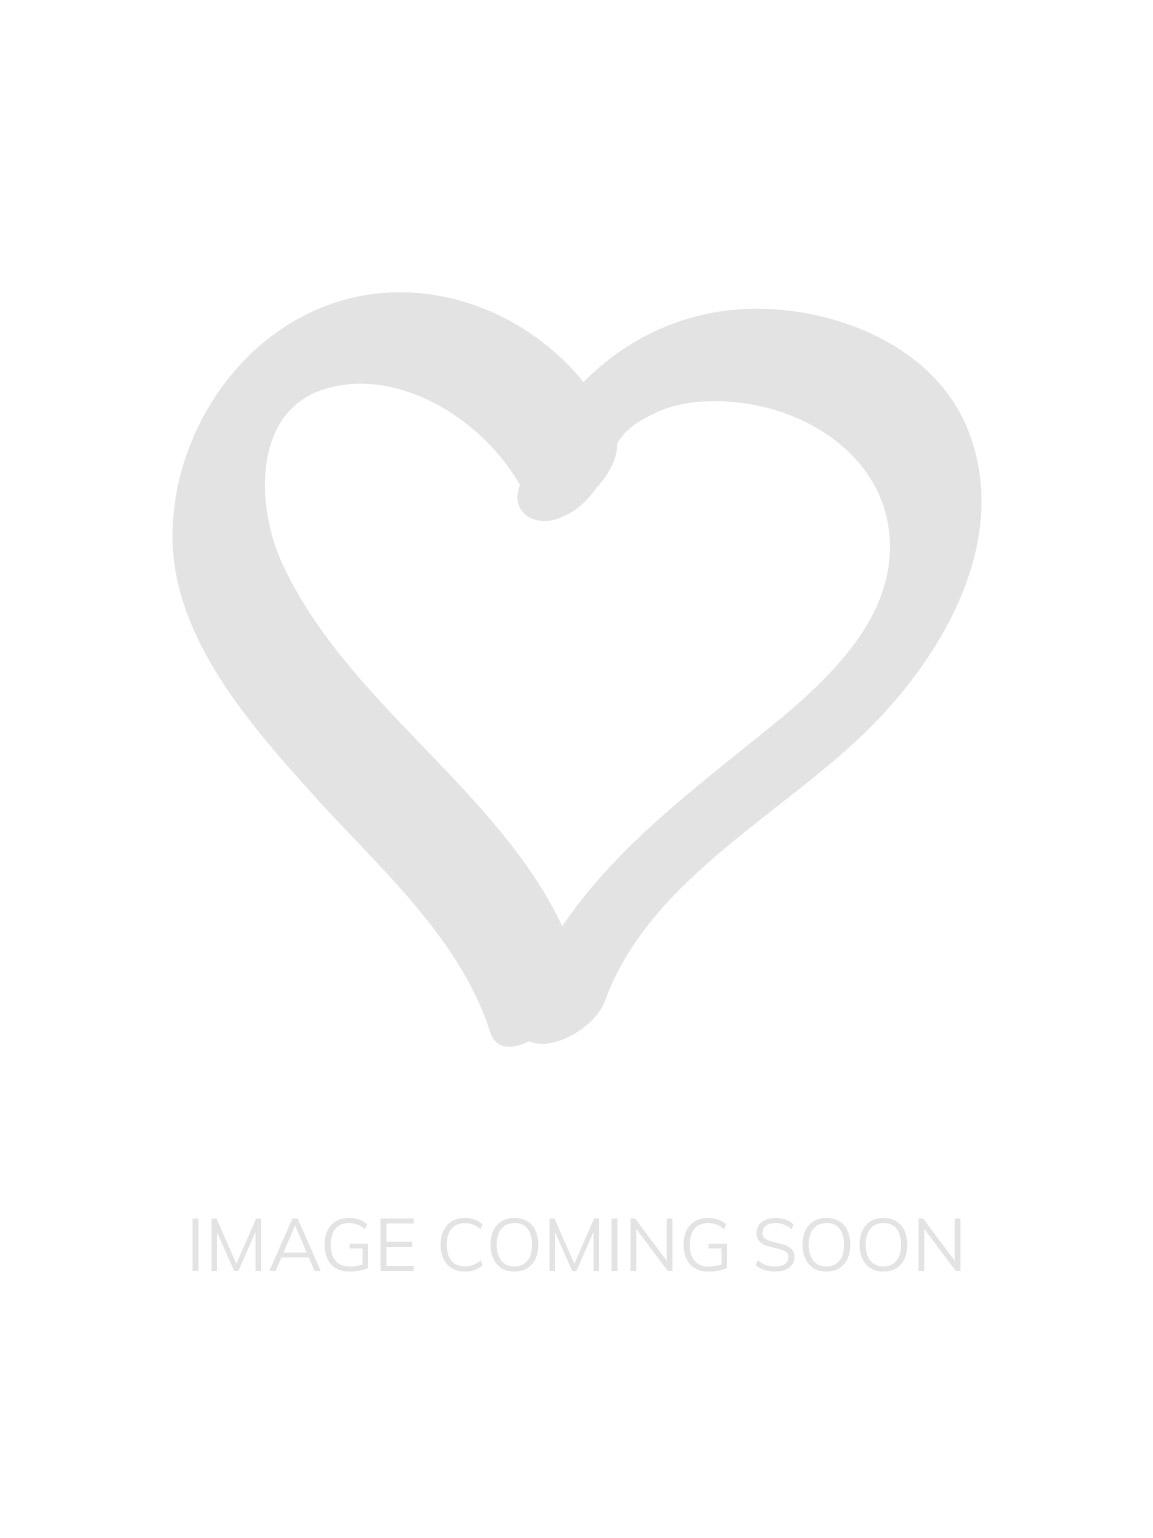 6e5b7966f7 Sundance Crossover Dress - Hot Pink